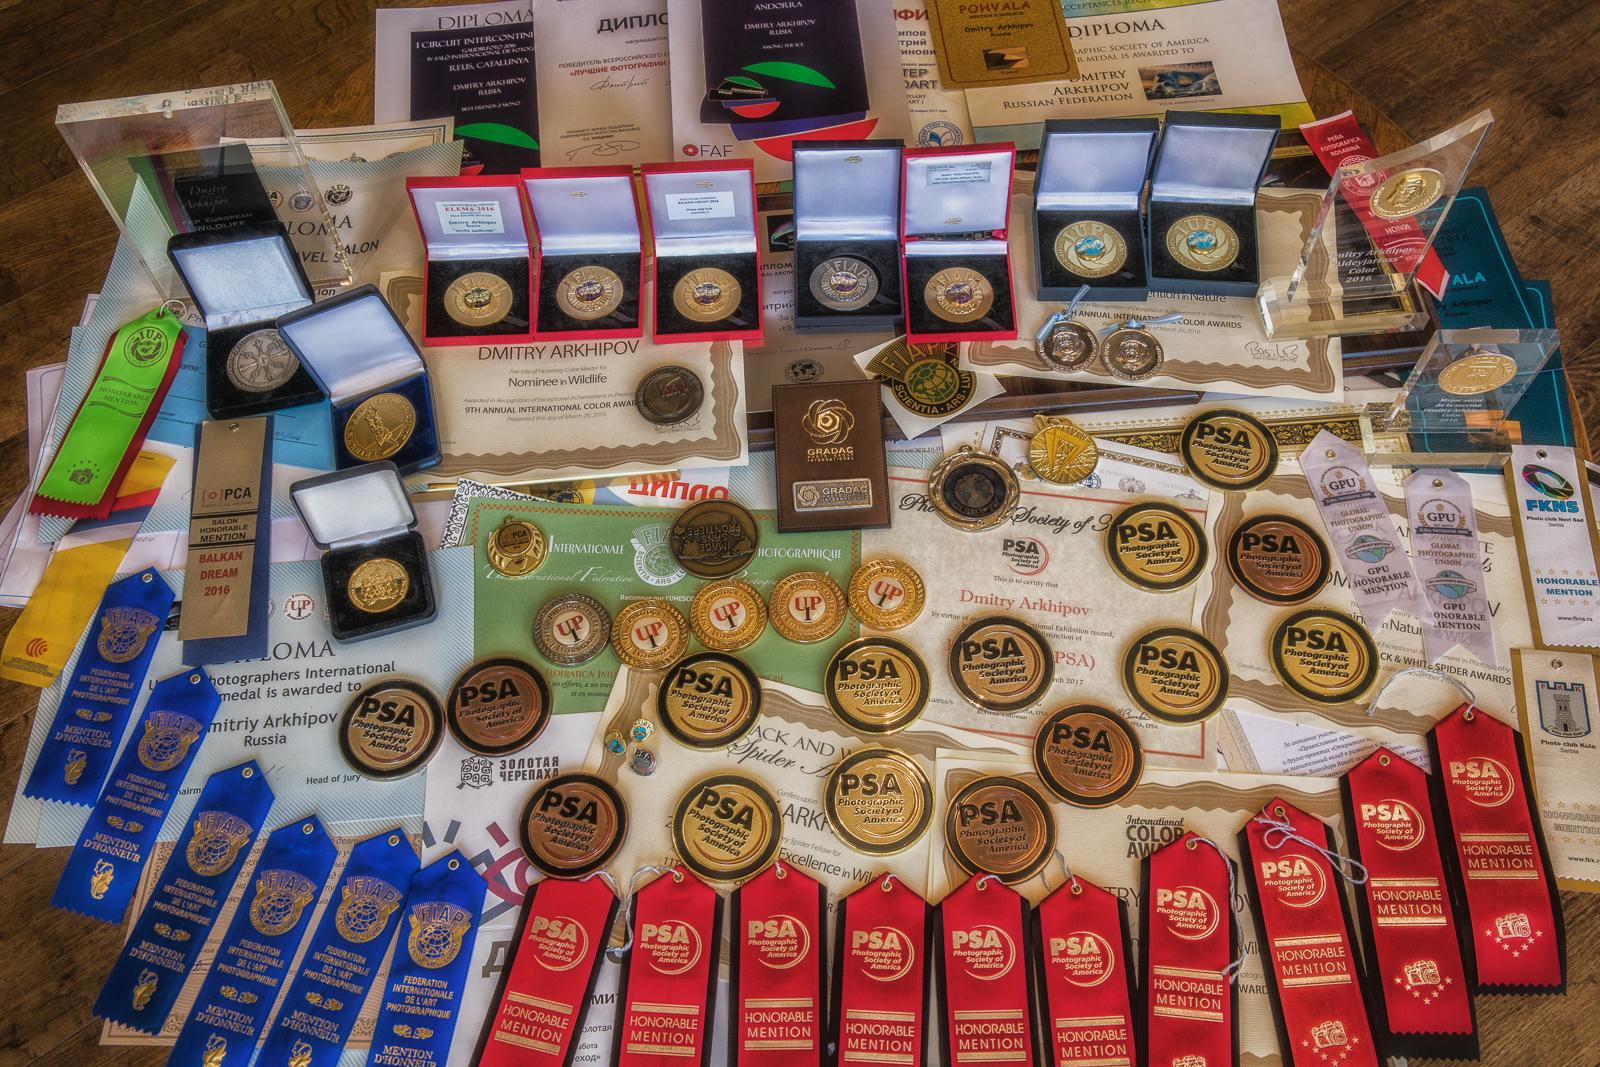 PSA, FIAP etc photo awards